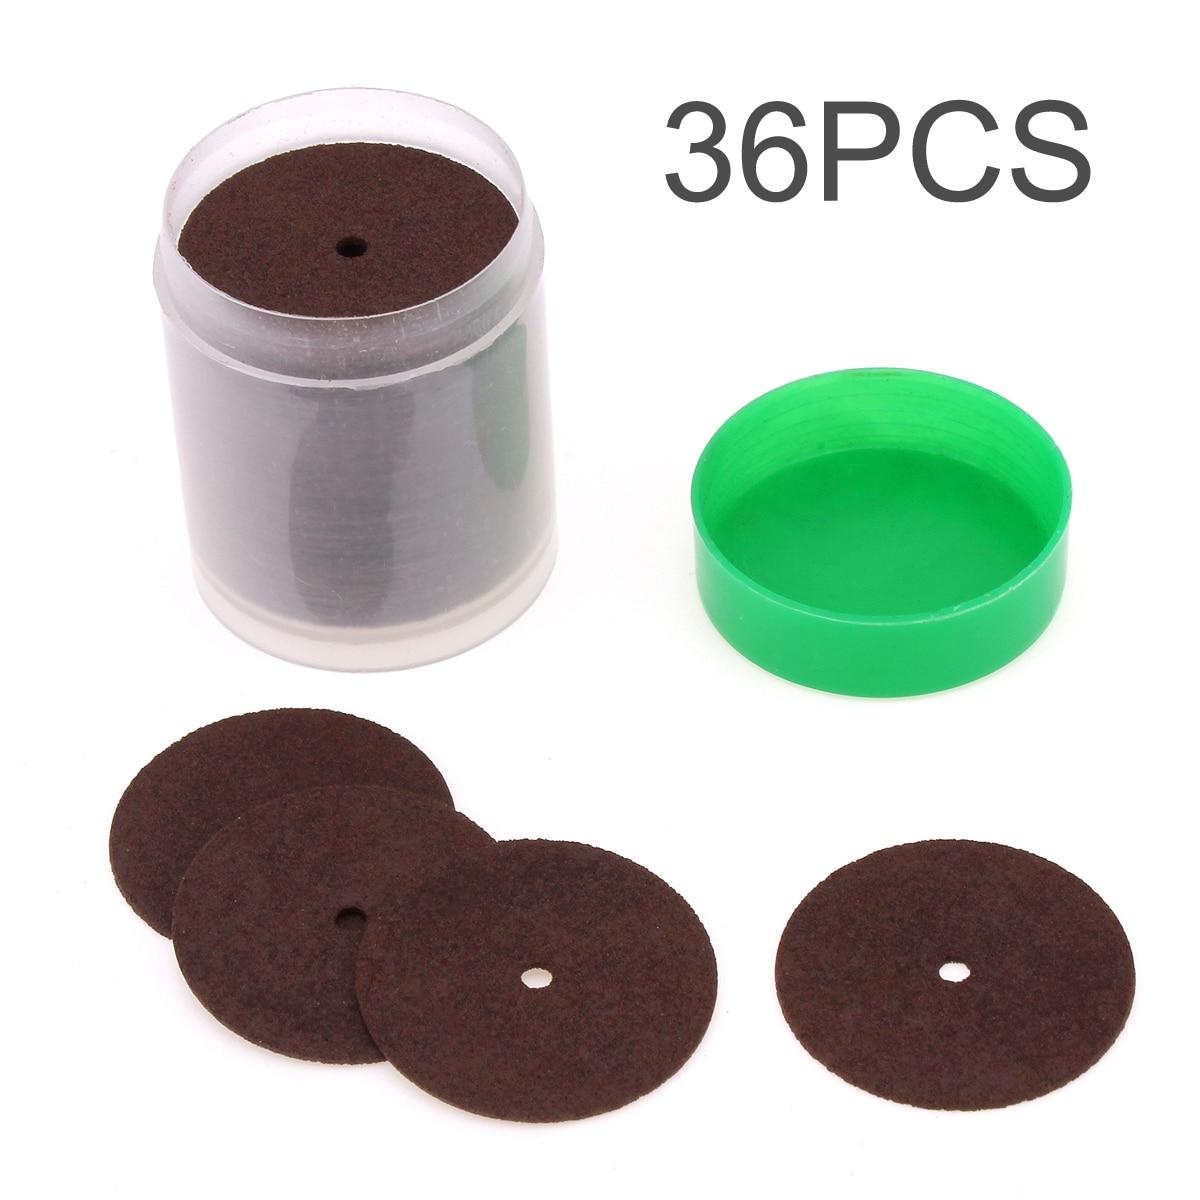 Cutting Disc 36pcs /lot Resin Cutting Wheel Disc Abrasive Sand Cut-off Wheels For  Rotary Tool  Circular Saw Blades